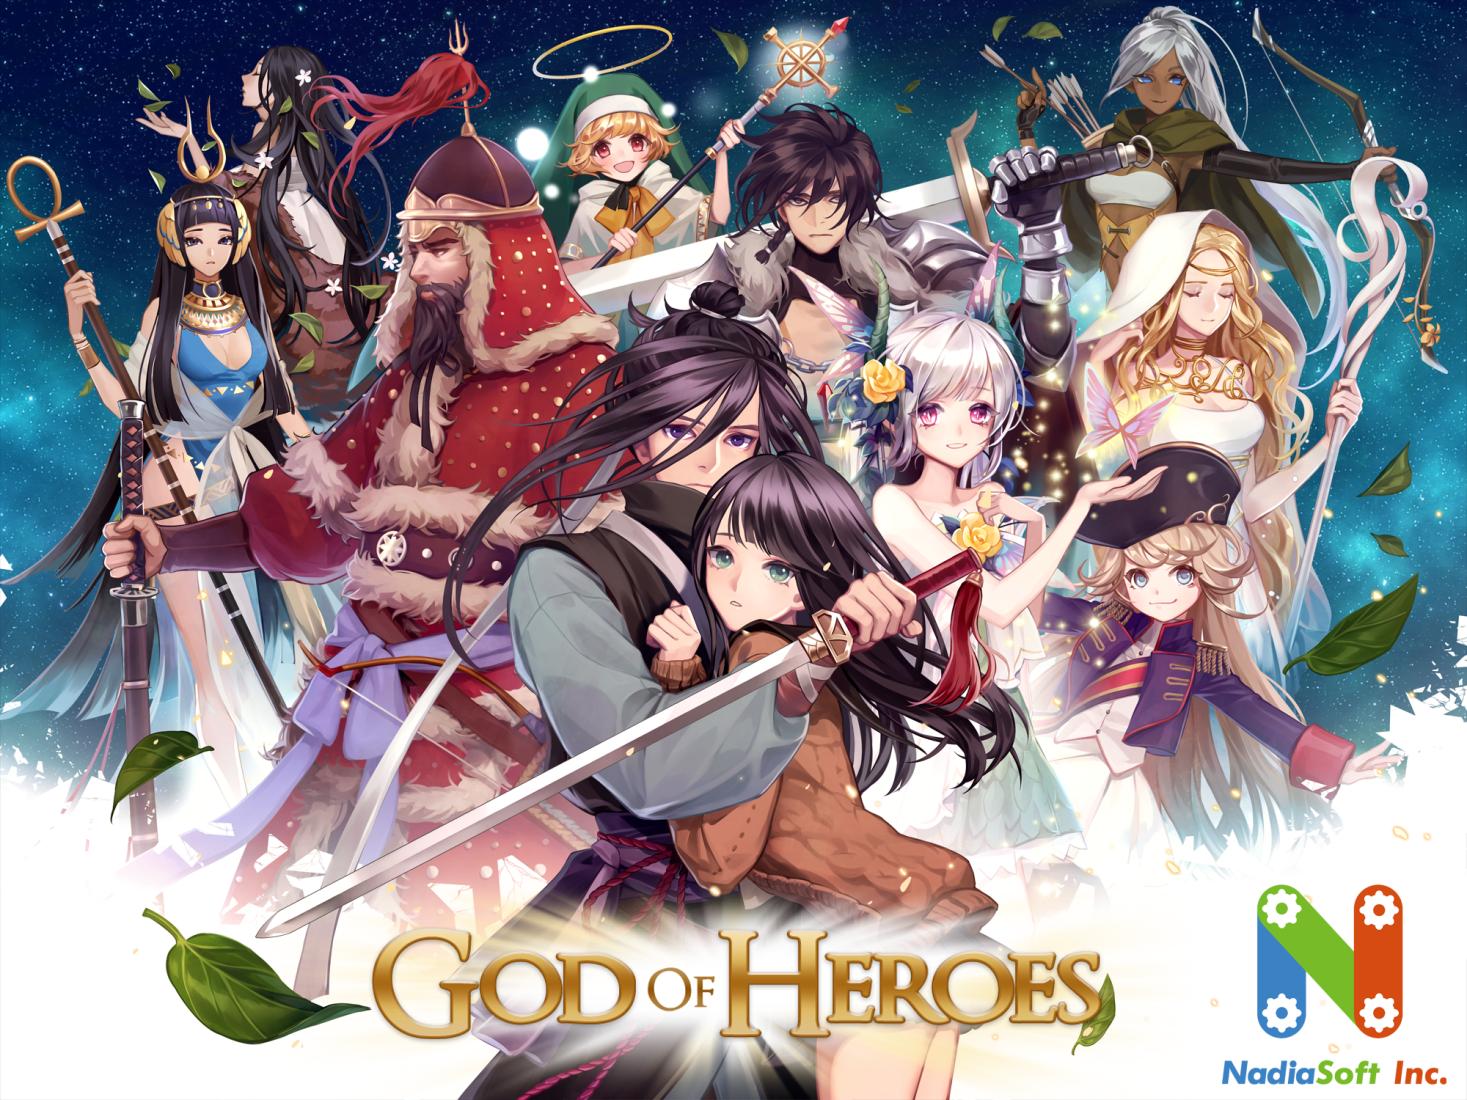 [MWU Korea '18]                   갓 오브 히어로즈              (God Of Heroes) / NadiaSoft